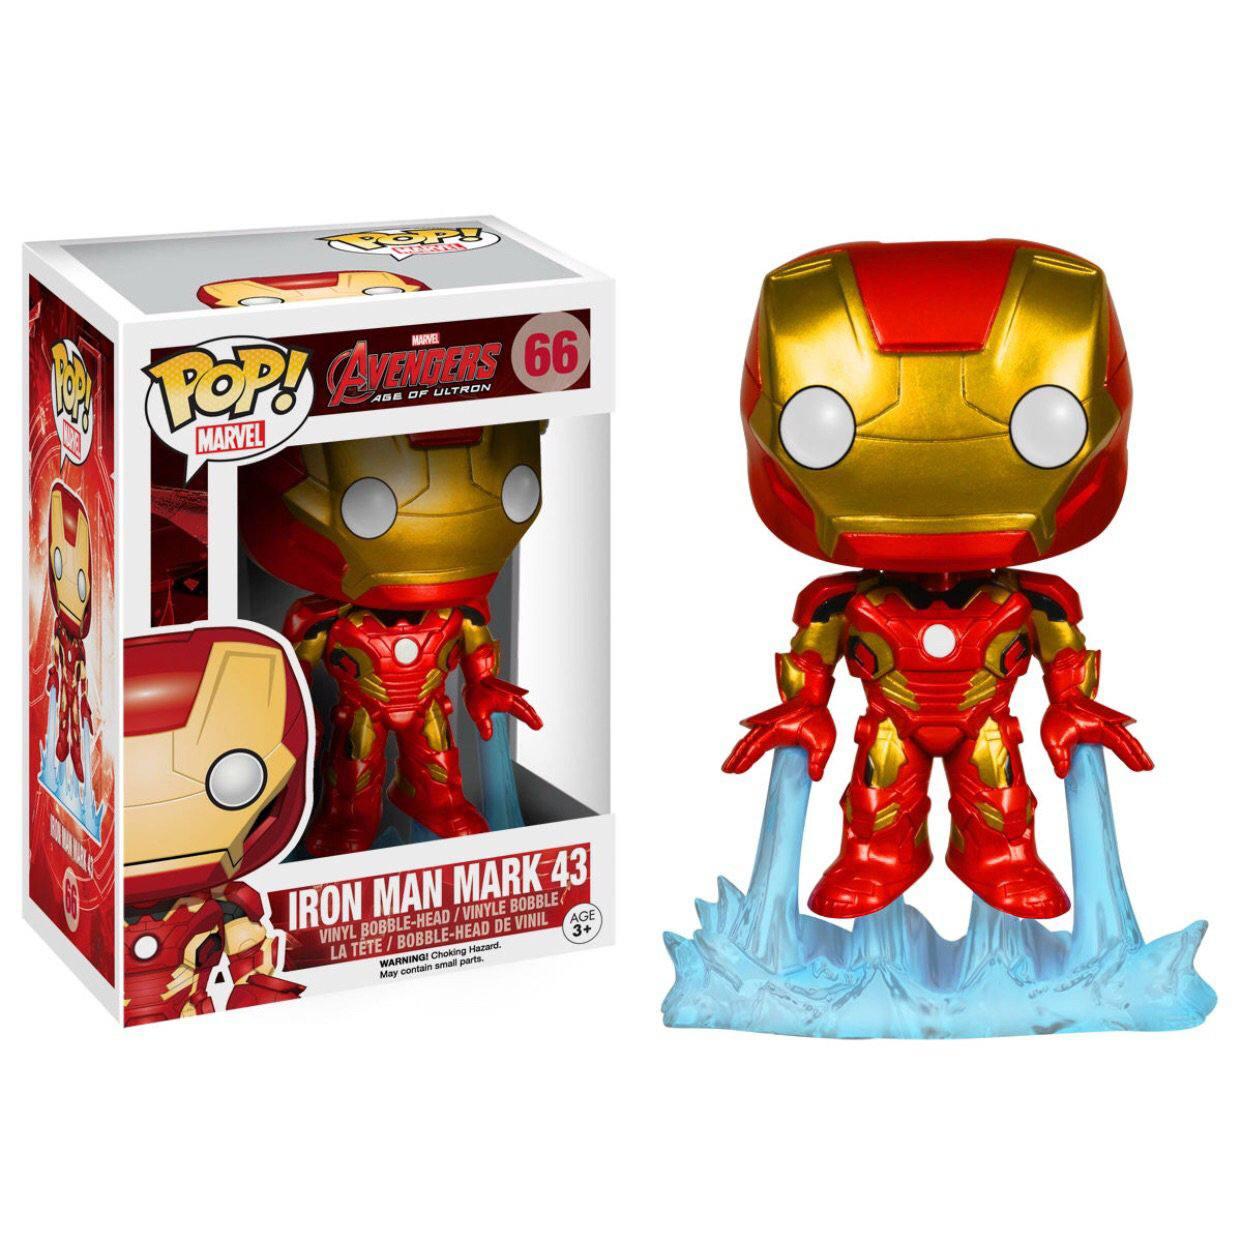 POP! Avengers: Age of Ultron - Iron Man Mark 43